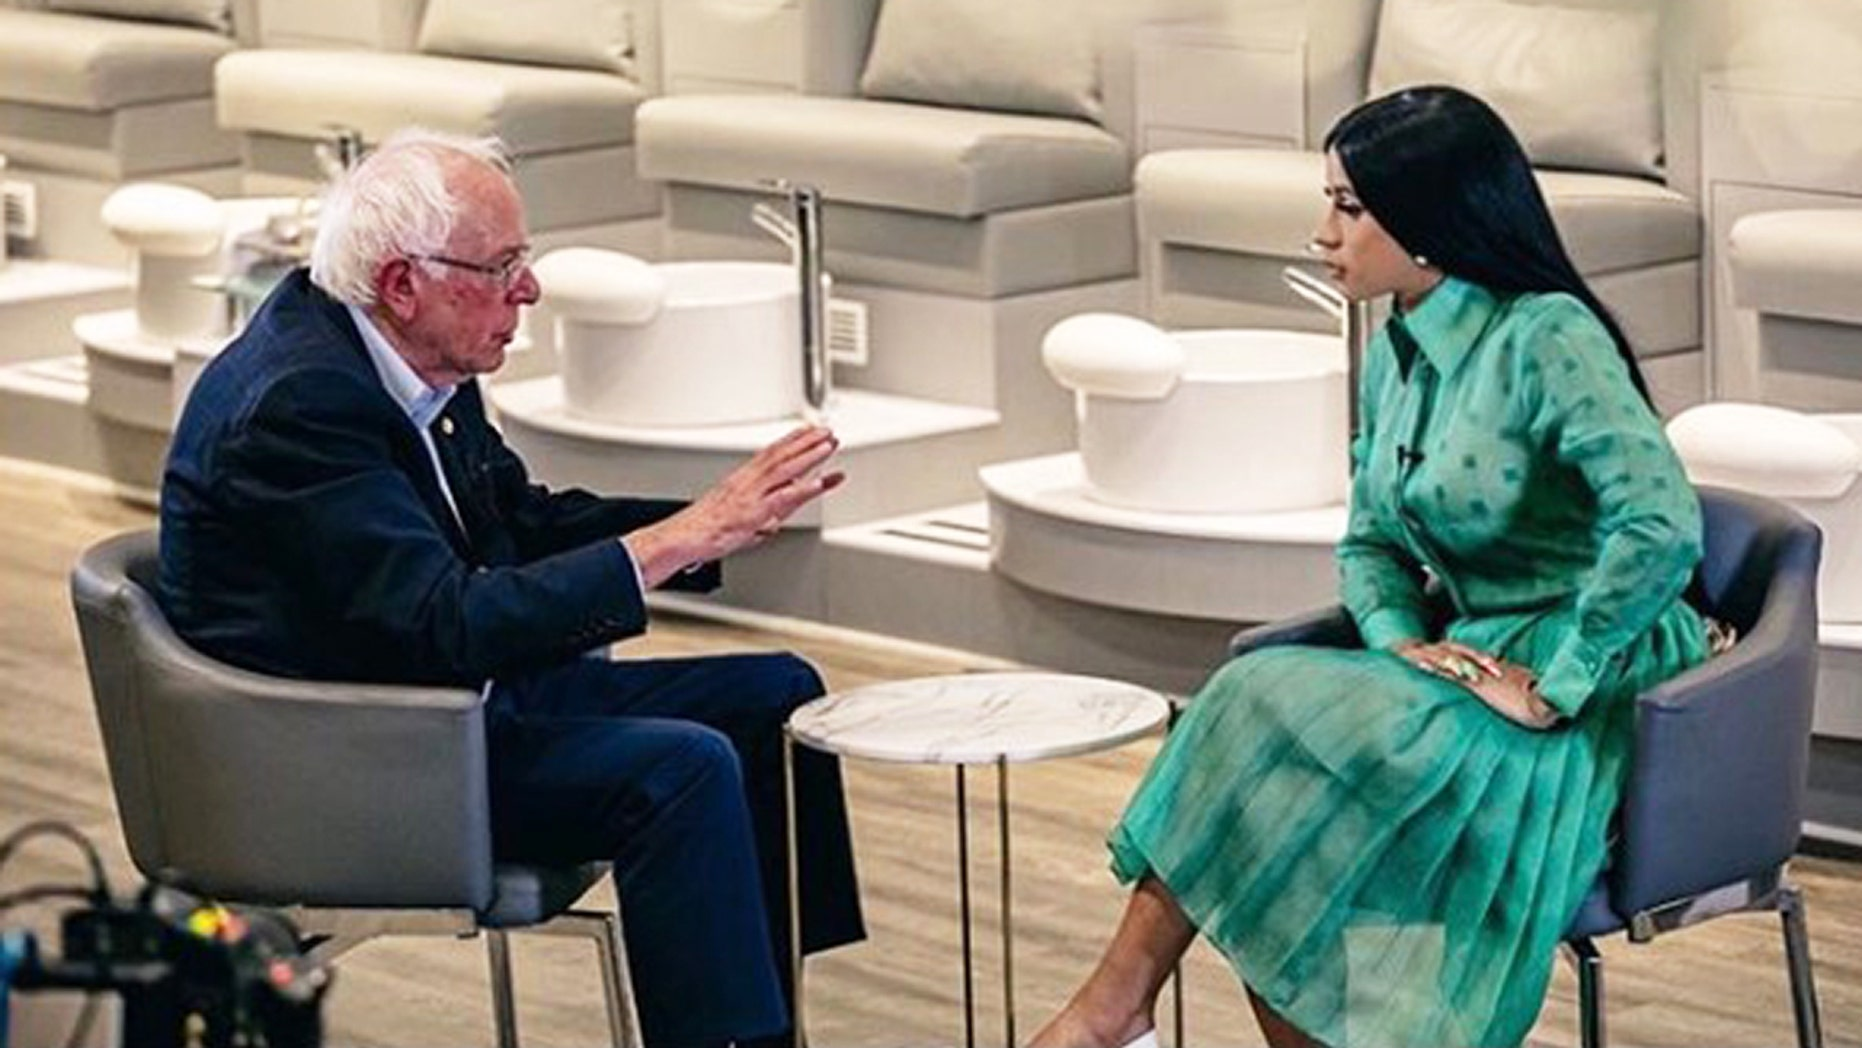 US Senator Bernie Sanders sits down with Cardi B in filmed discussion about politics. (Photo: Instagram/@iamcardib)